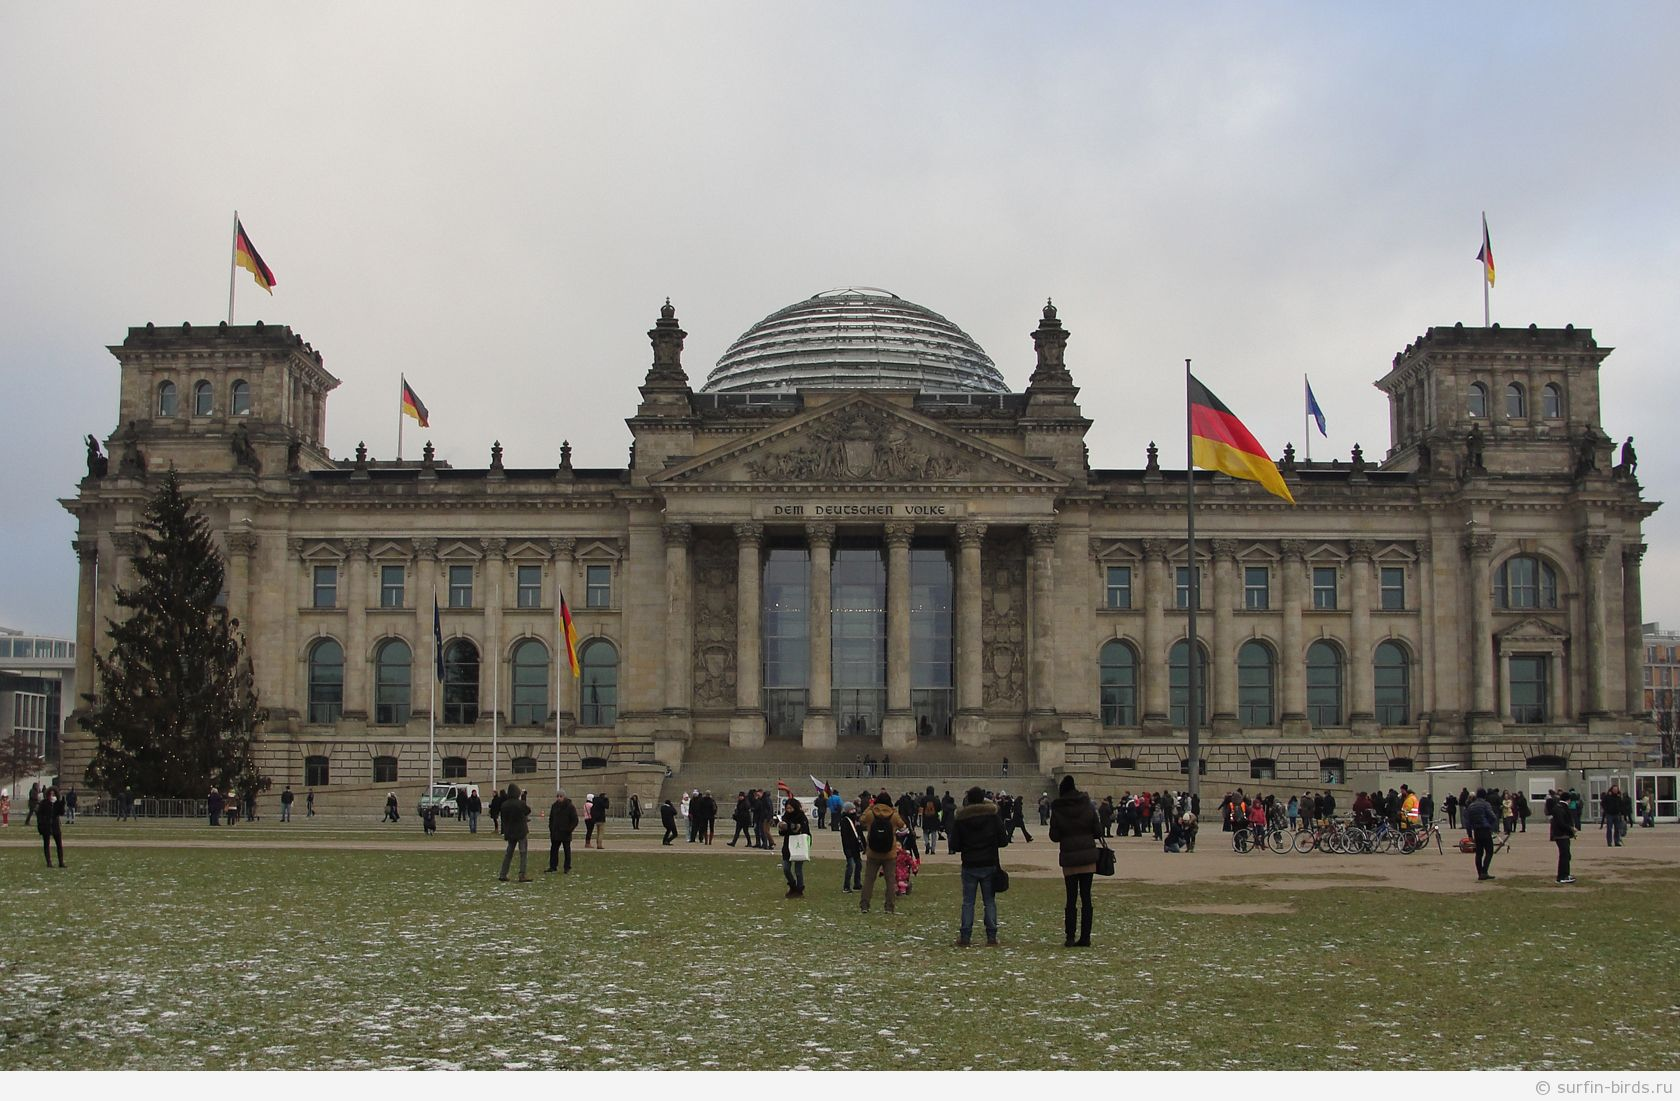 здание Рейхстага (Reichstagsgebäude)